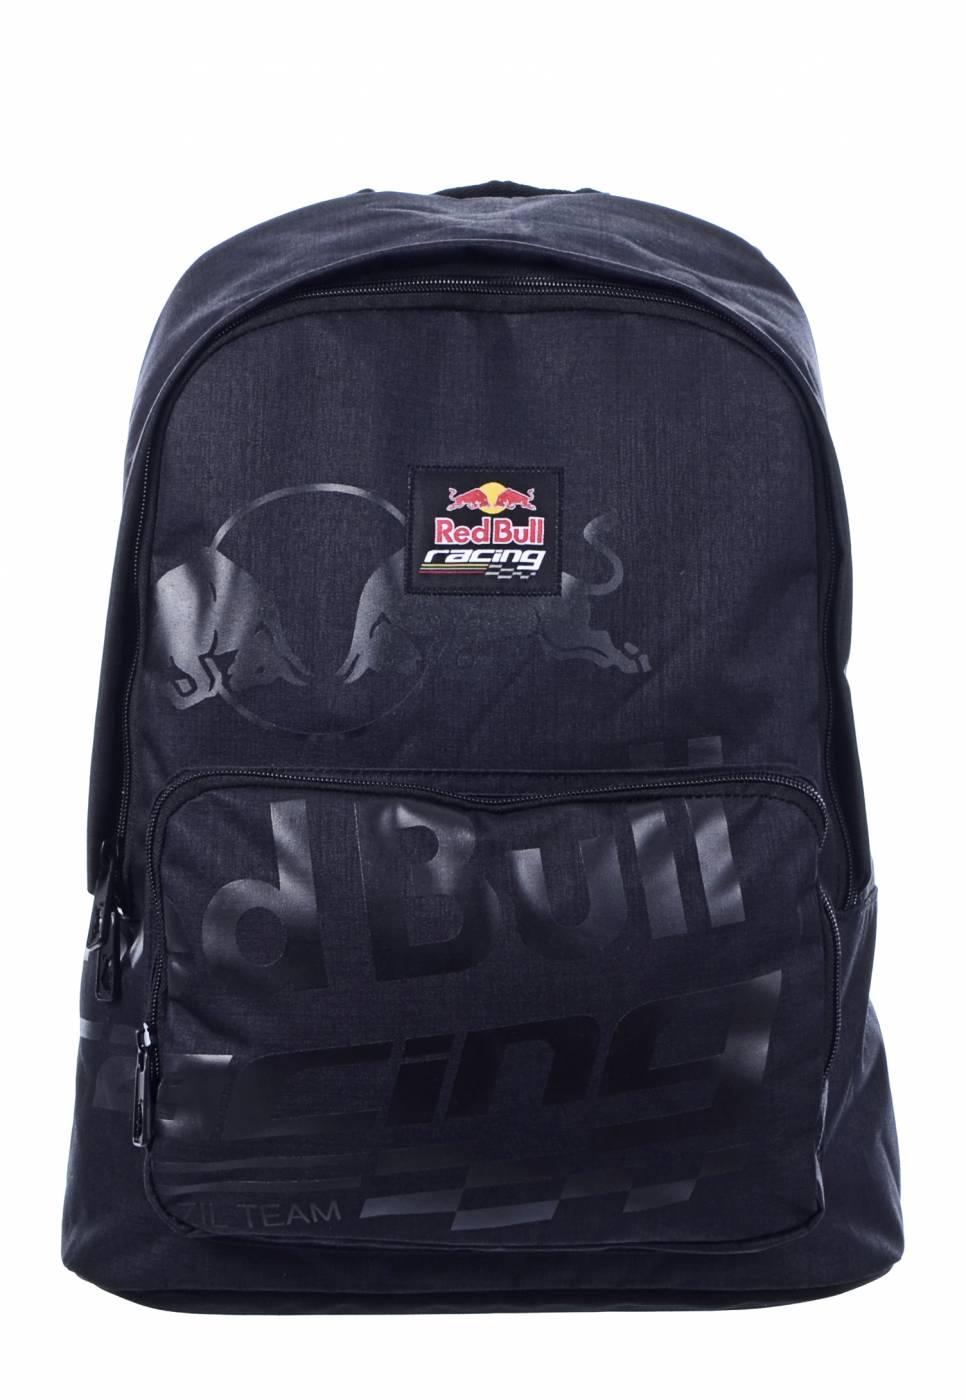 Mochila Nytron Red Bull RB4019 - Preto